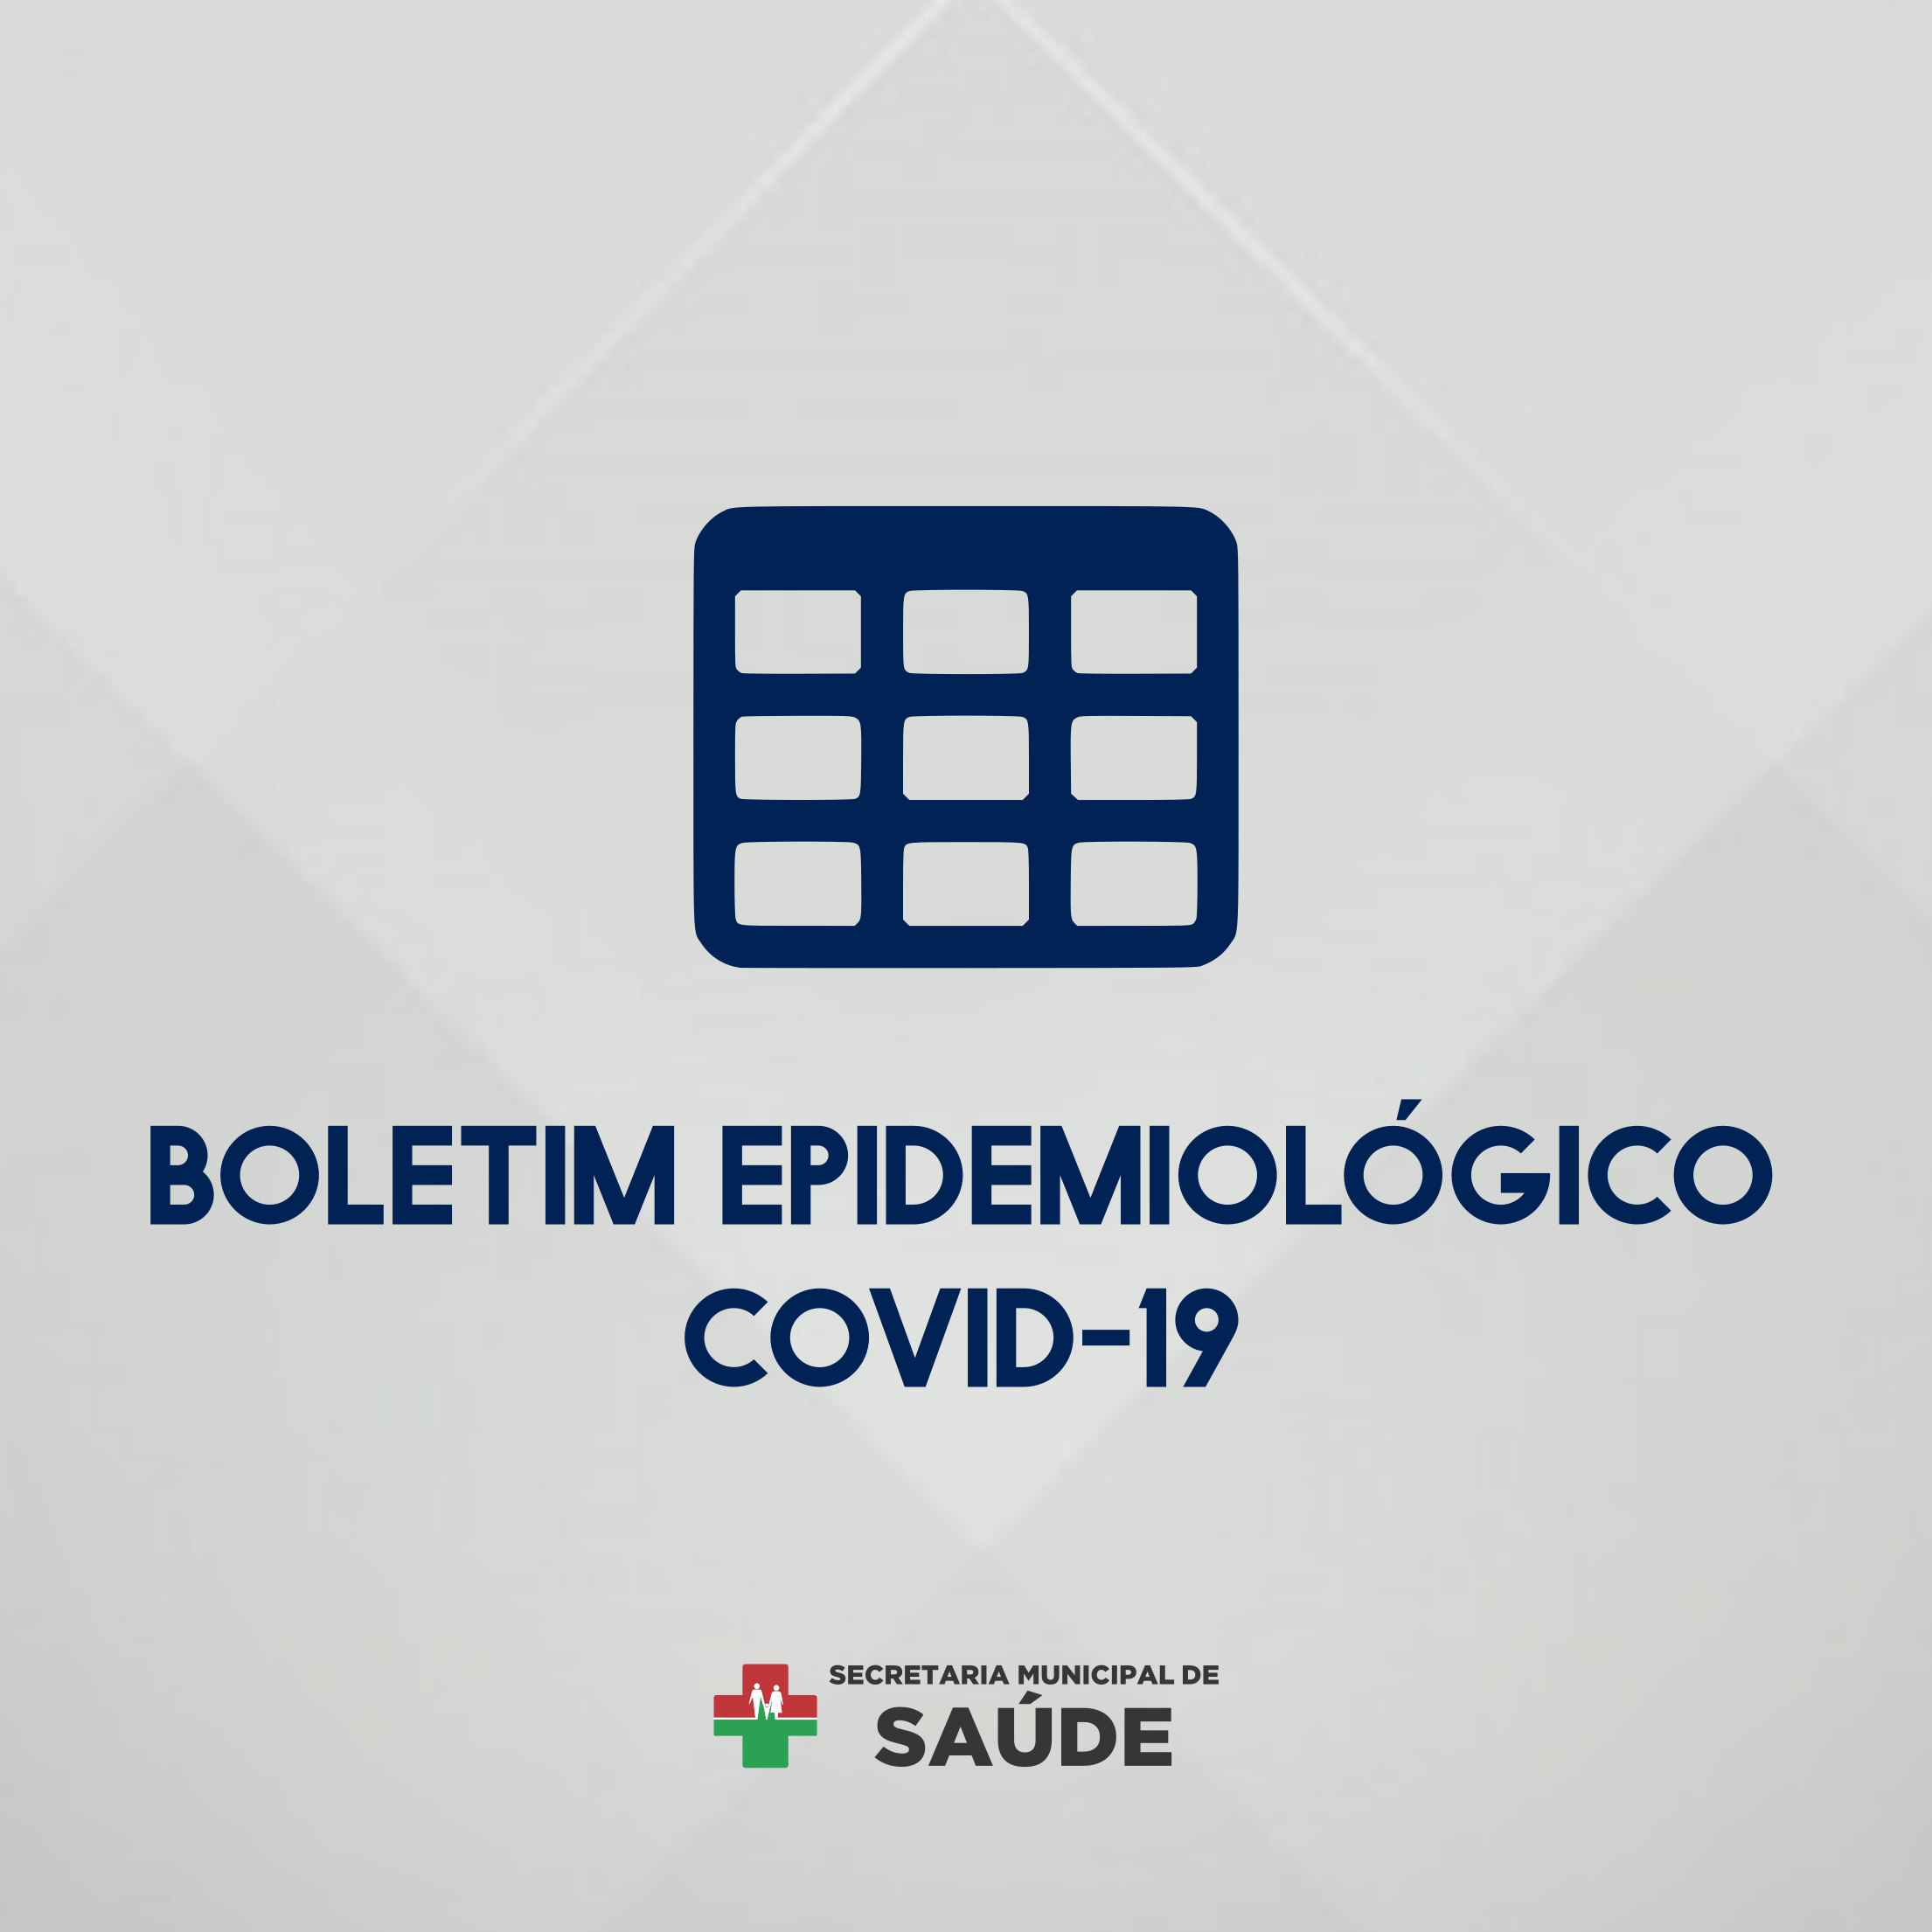 BOLETIM EPIDEMIOLÓGICO Nº 175 (COVID-19)